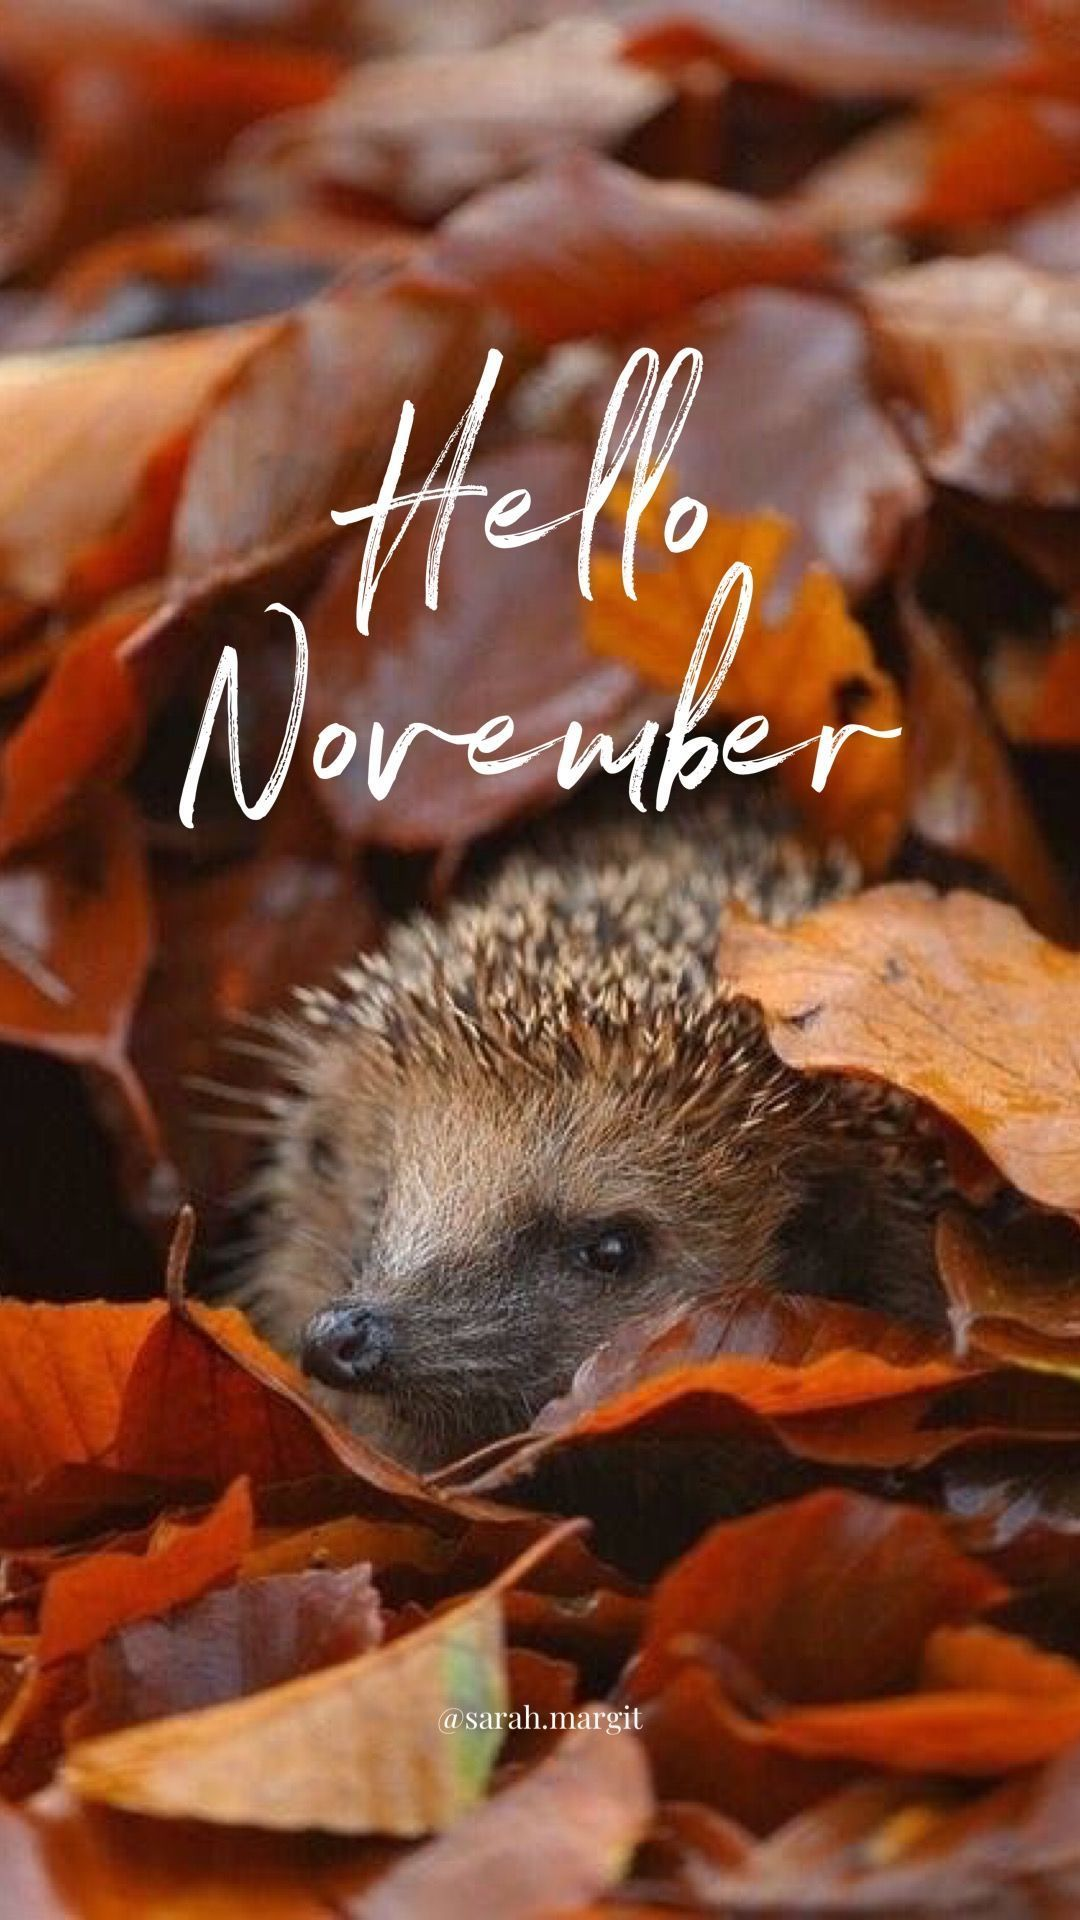 Hello November Wallpaper #hellonovemberwallpaper #hellonovemberwallpaper Hello November Wallpaper #hellonovemberwallpaper #hellonovembermonth